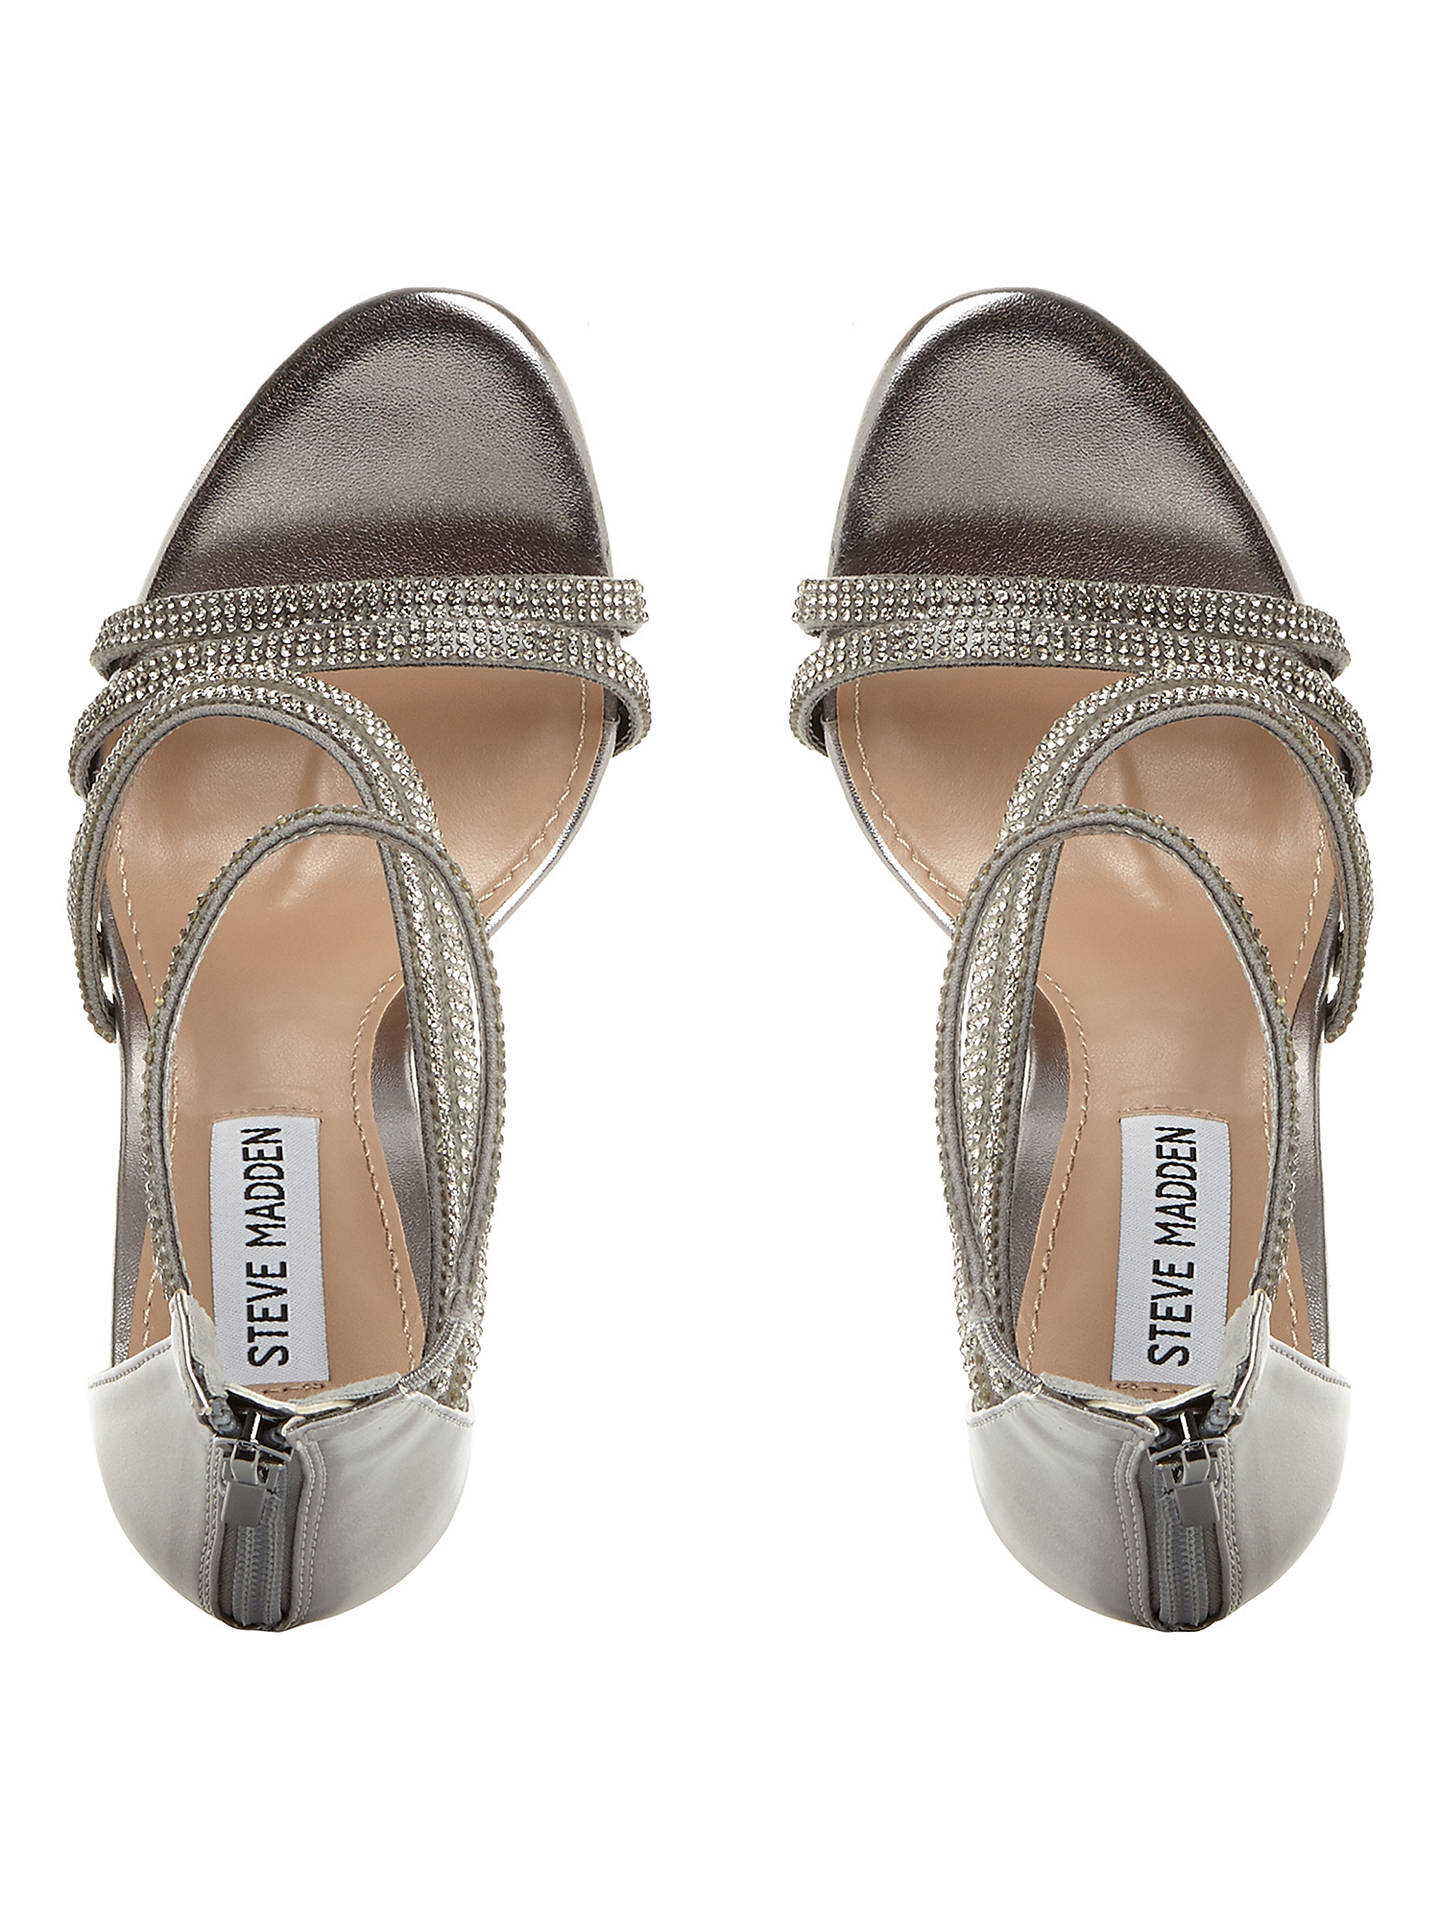 4a43ab0101ec Steve Madden Sweetest Multi Strap Sandals at John Lewis   Partners